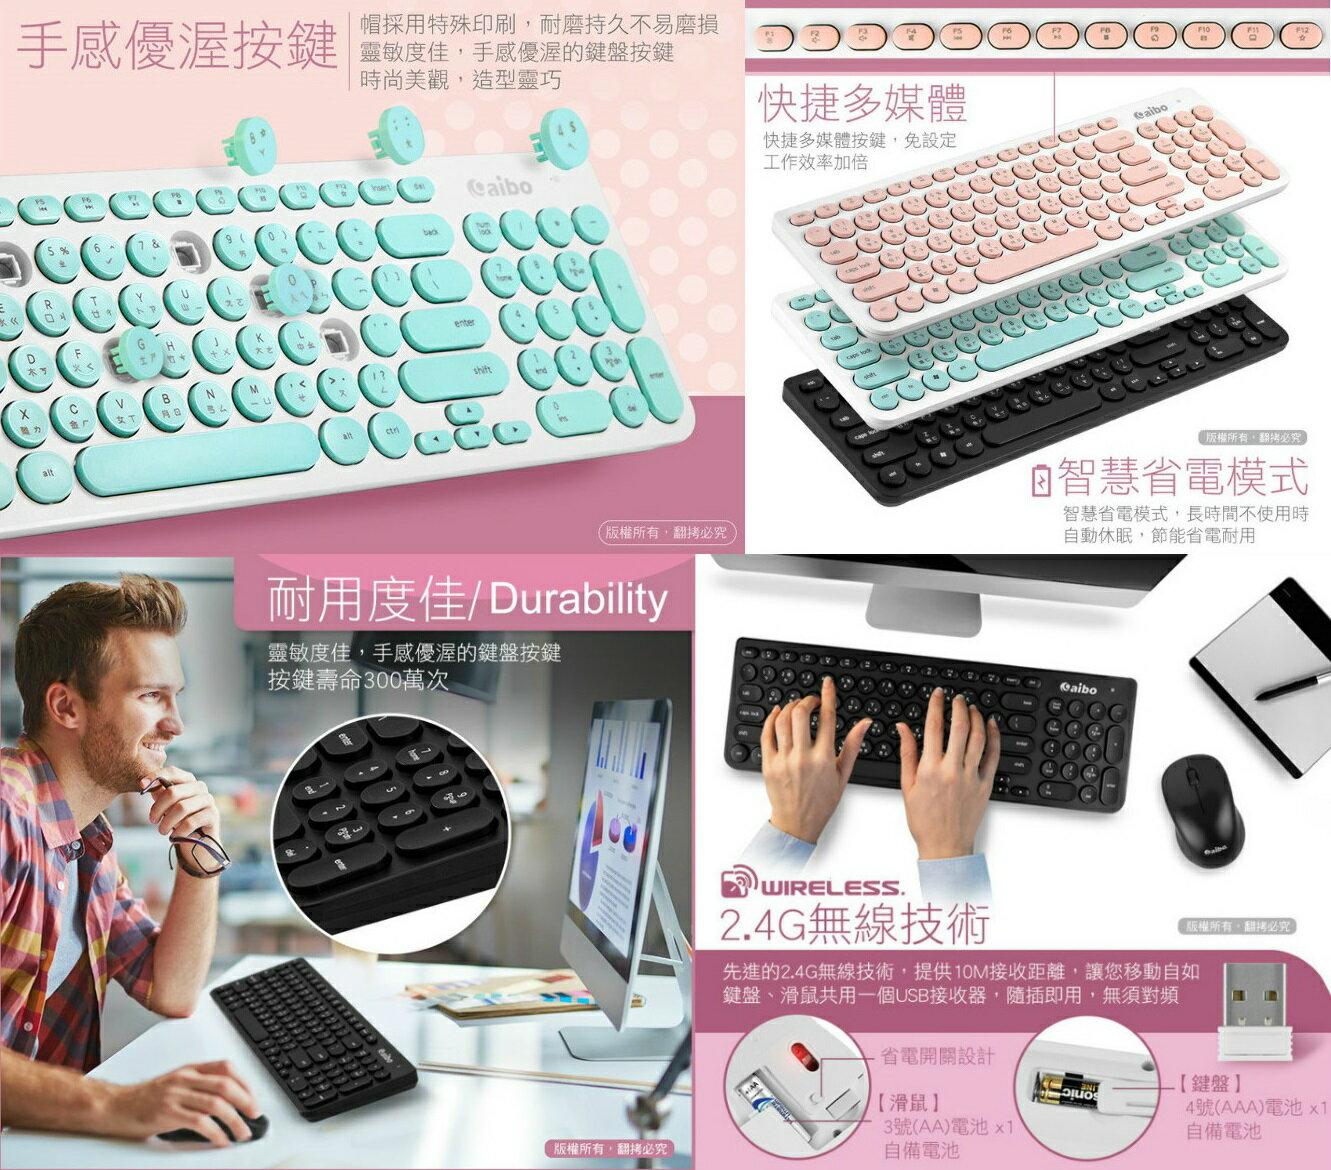 【Fun心玩】aibo 鈞嵐 KM09 馬卡龍復古圓點 2.4G 無線 鍵盤滑鼠組 可愛造型 靜音型 鍵鼠組 自動休眠省電